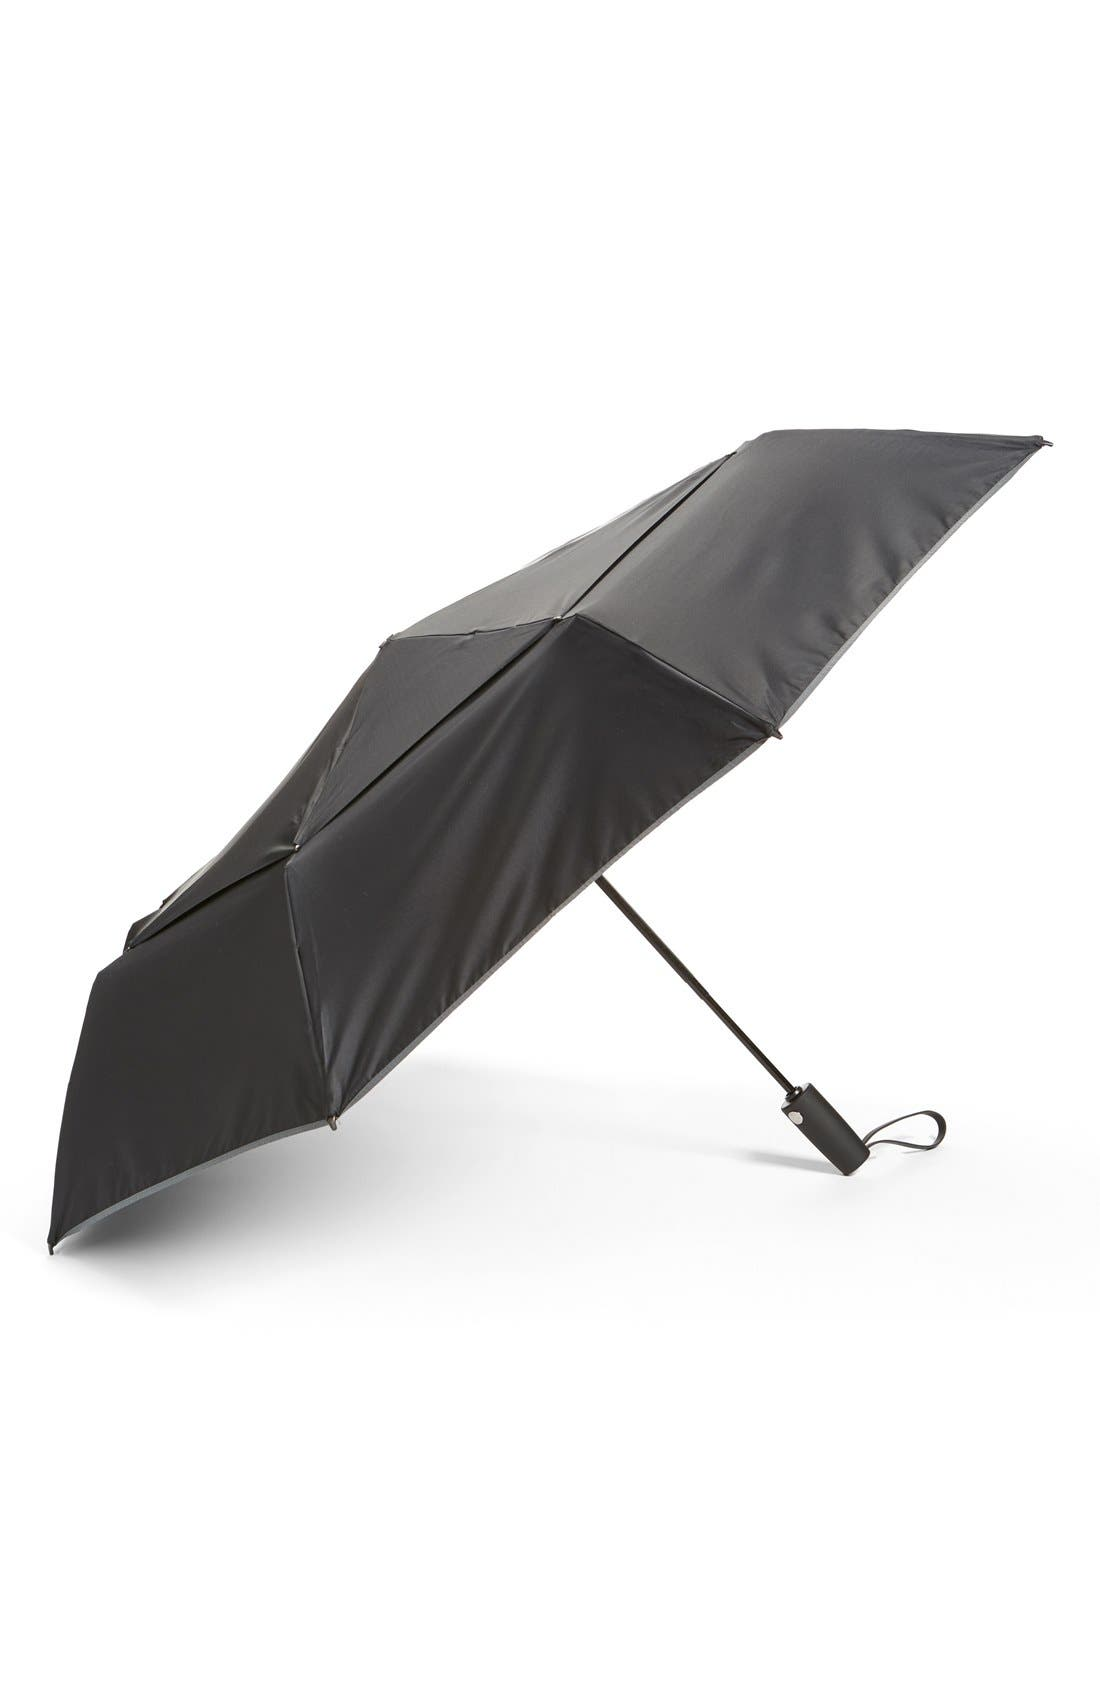 Large Auto Close Umbrella,                             Main thumbnail 1, color,                             Black